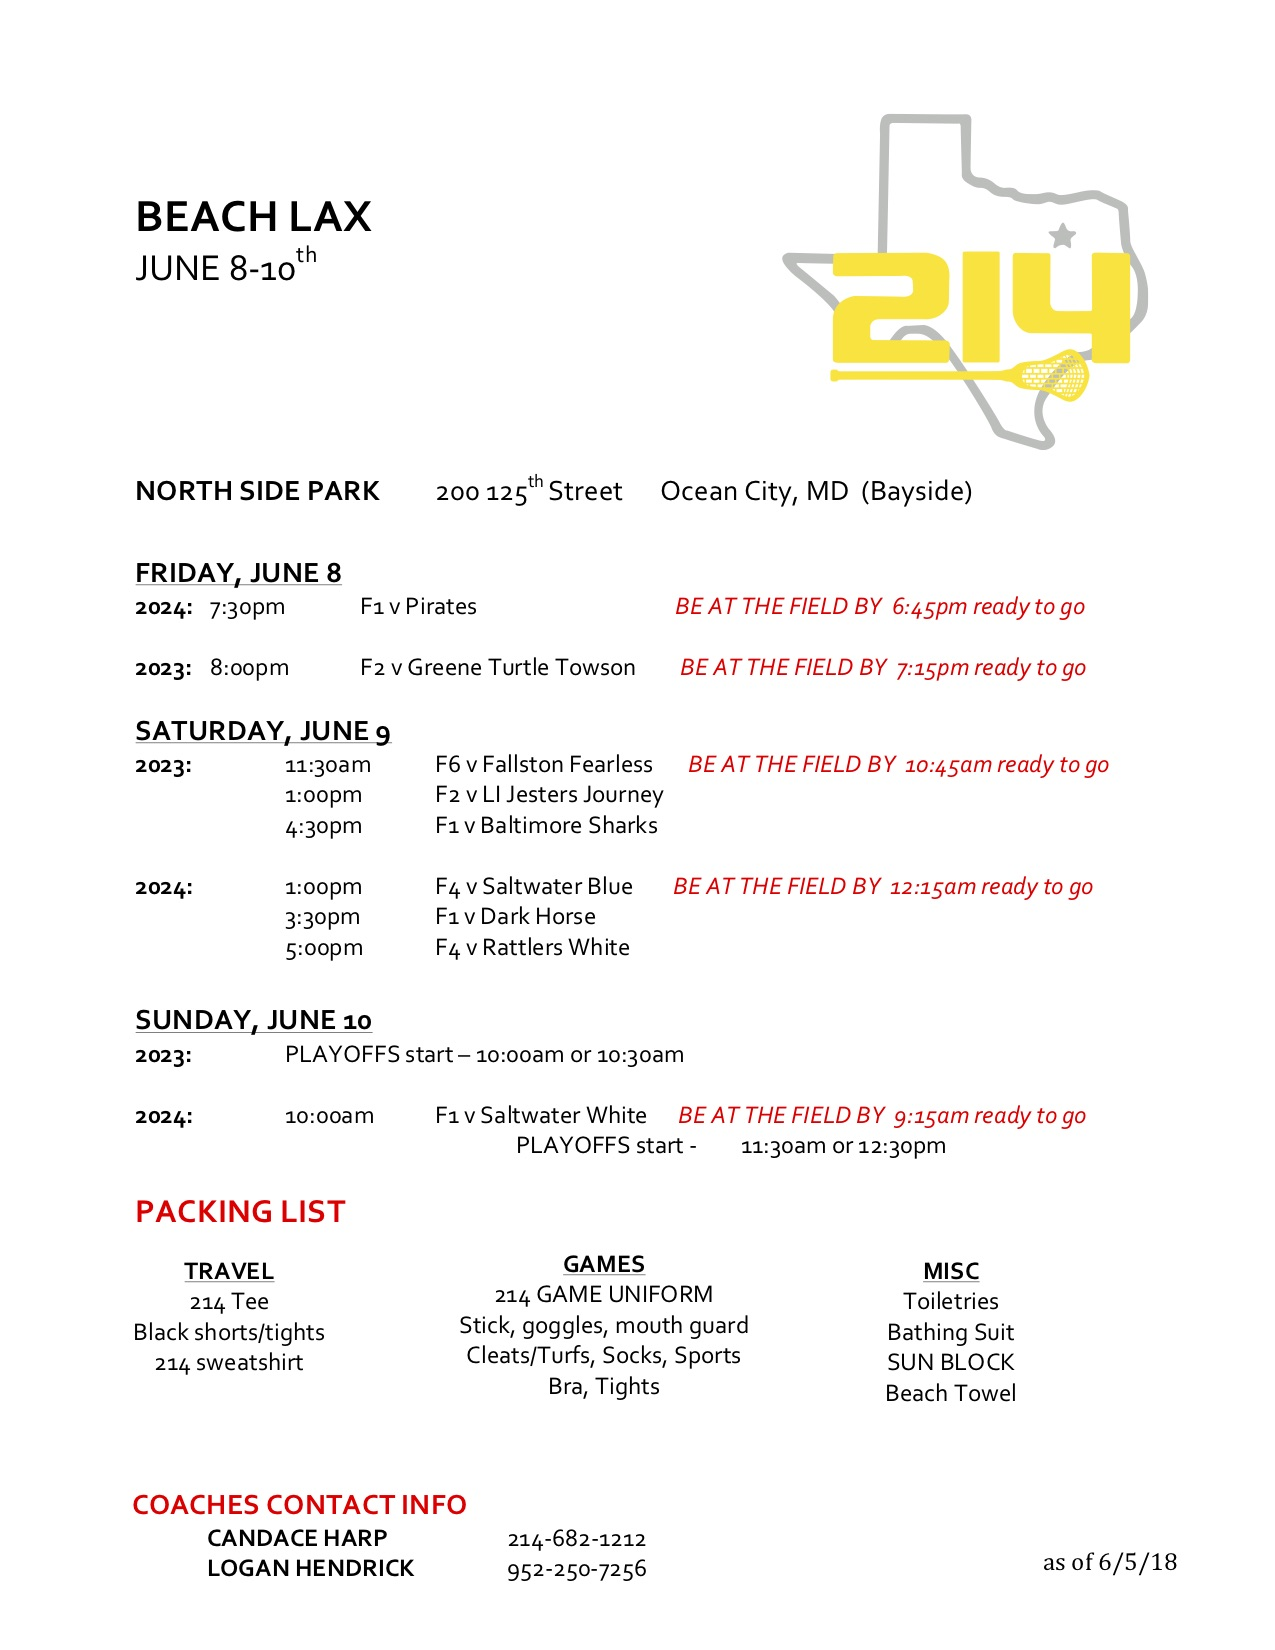 BEACH LAX ITINERARY.PACKING LIST v2.jpg